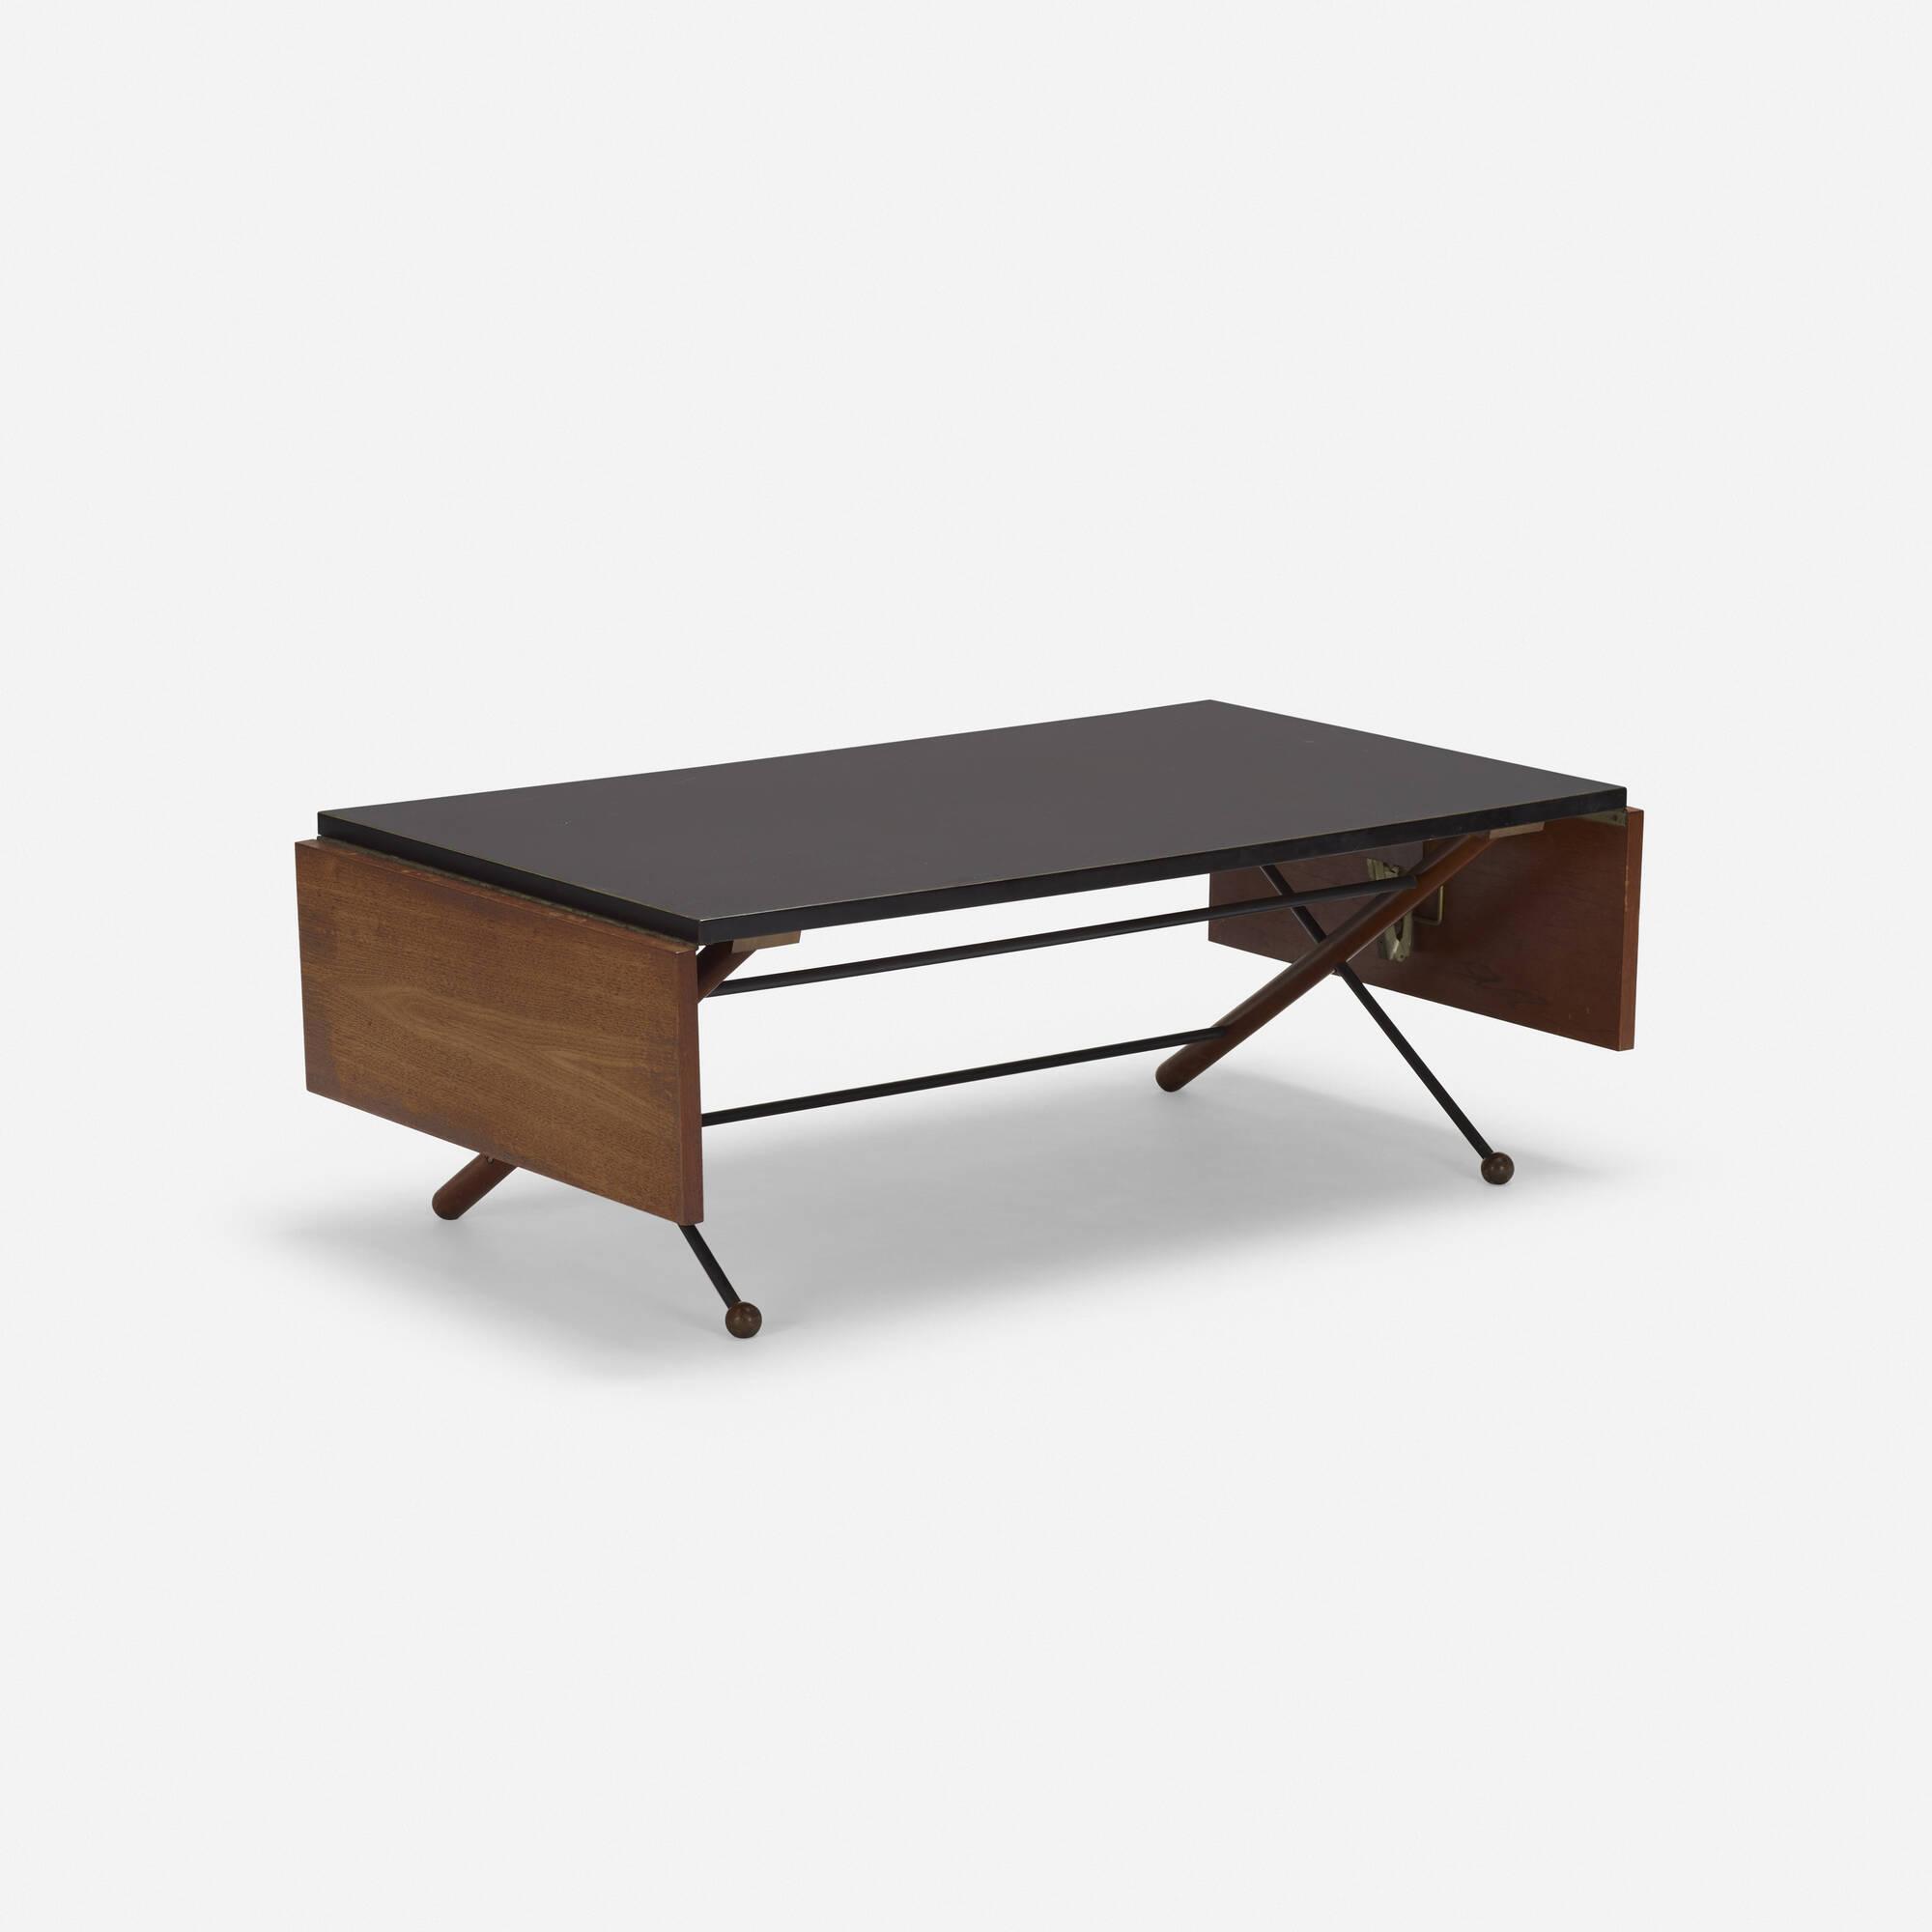 156 greta magnusson grossman coffee table design 26 october 156 greta magnusson grossman coffee table 2 of 5 geotapseo Gallery